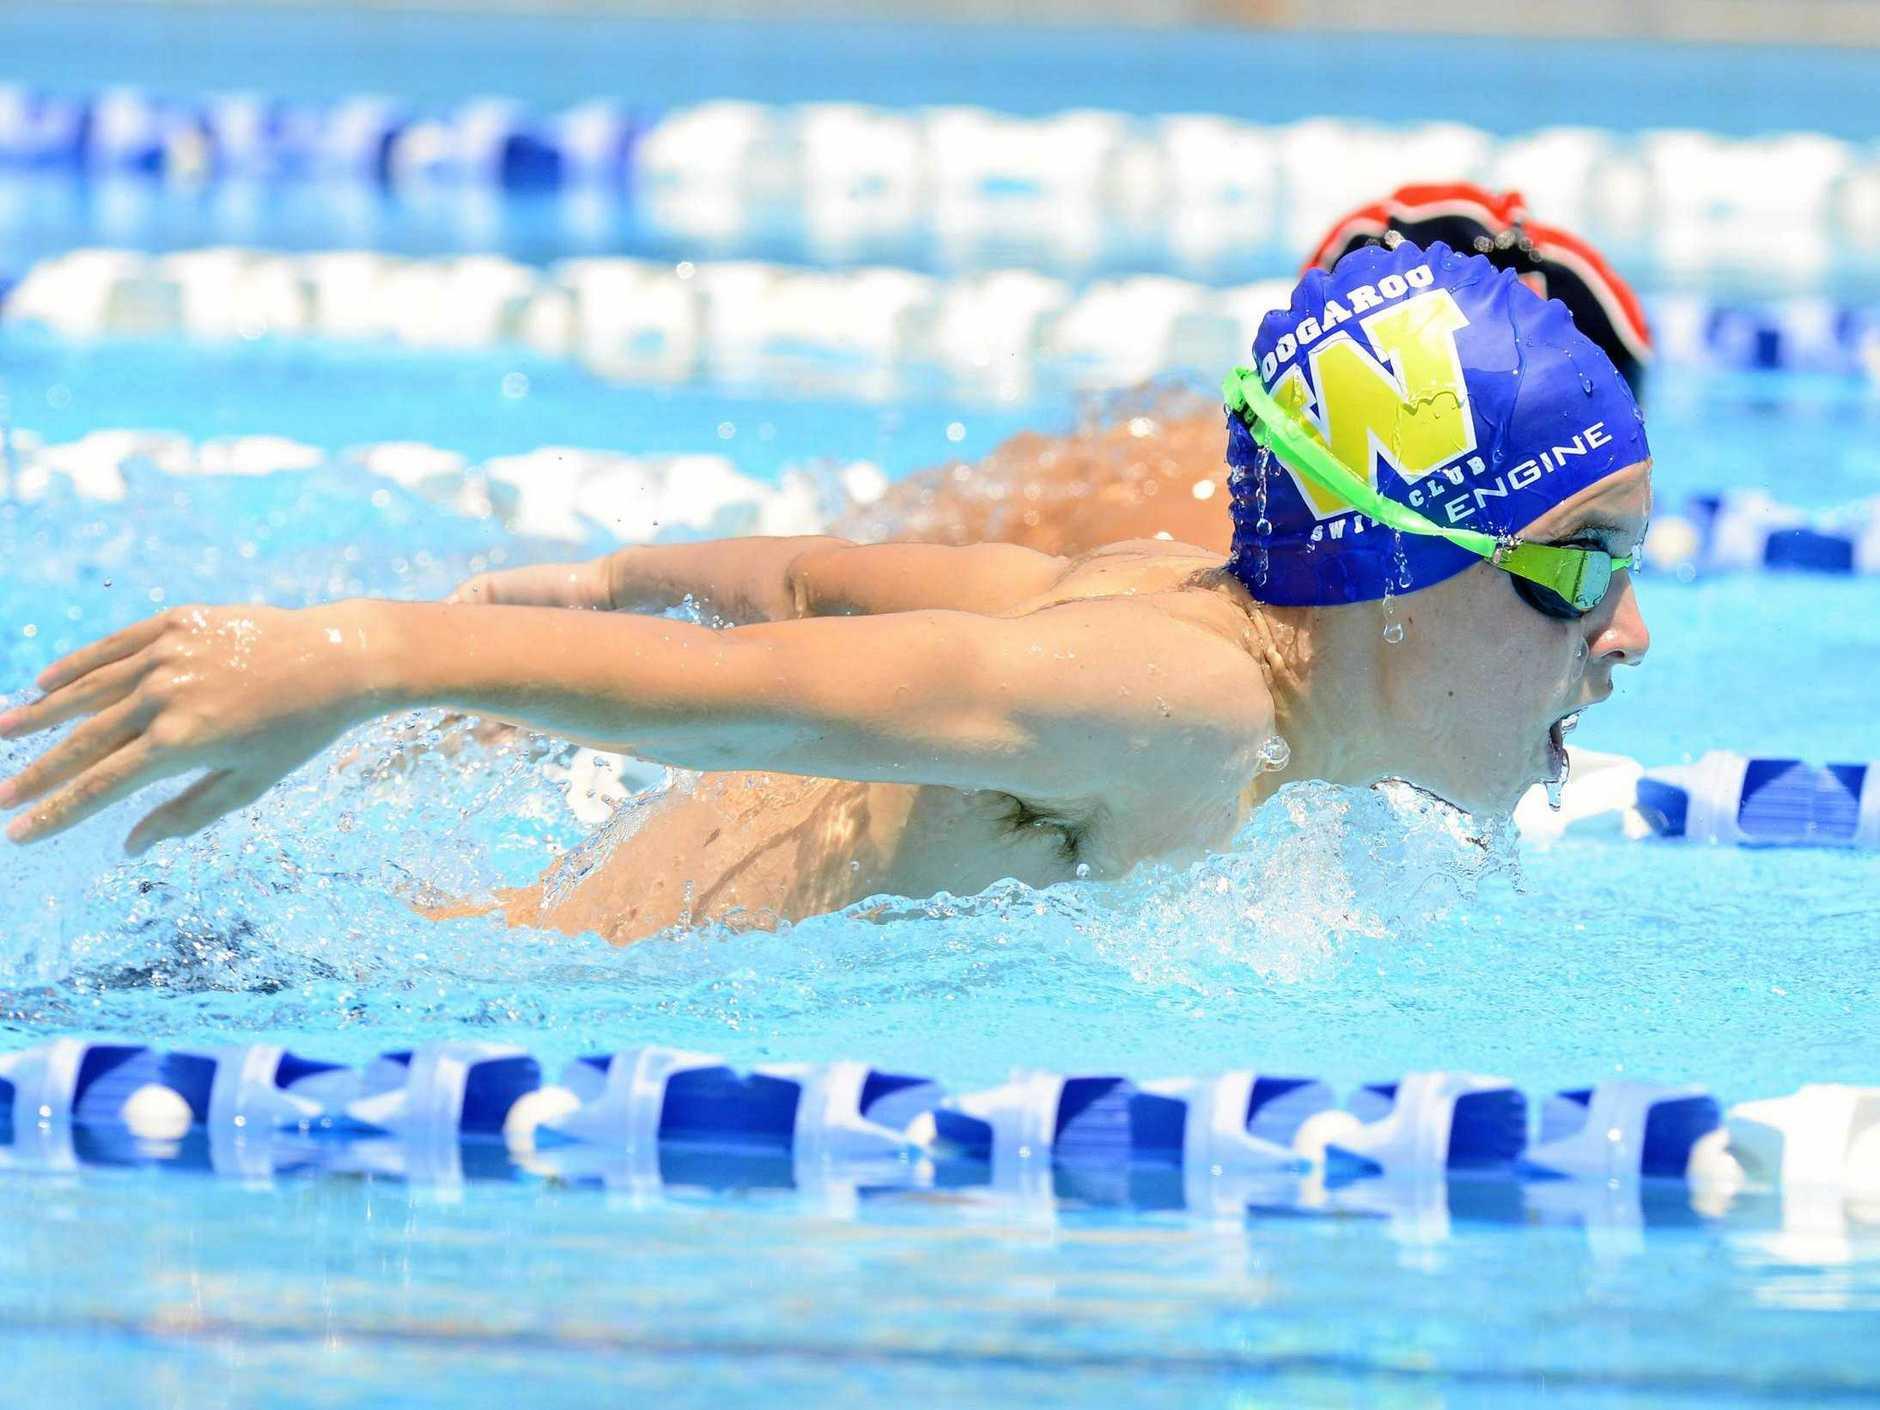 Woogaroo Swim club's Jordan Lane pushes himself in the 200m butterfly at the Bundamba Swim Centre.